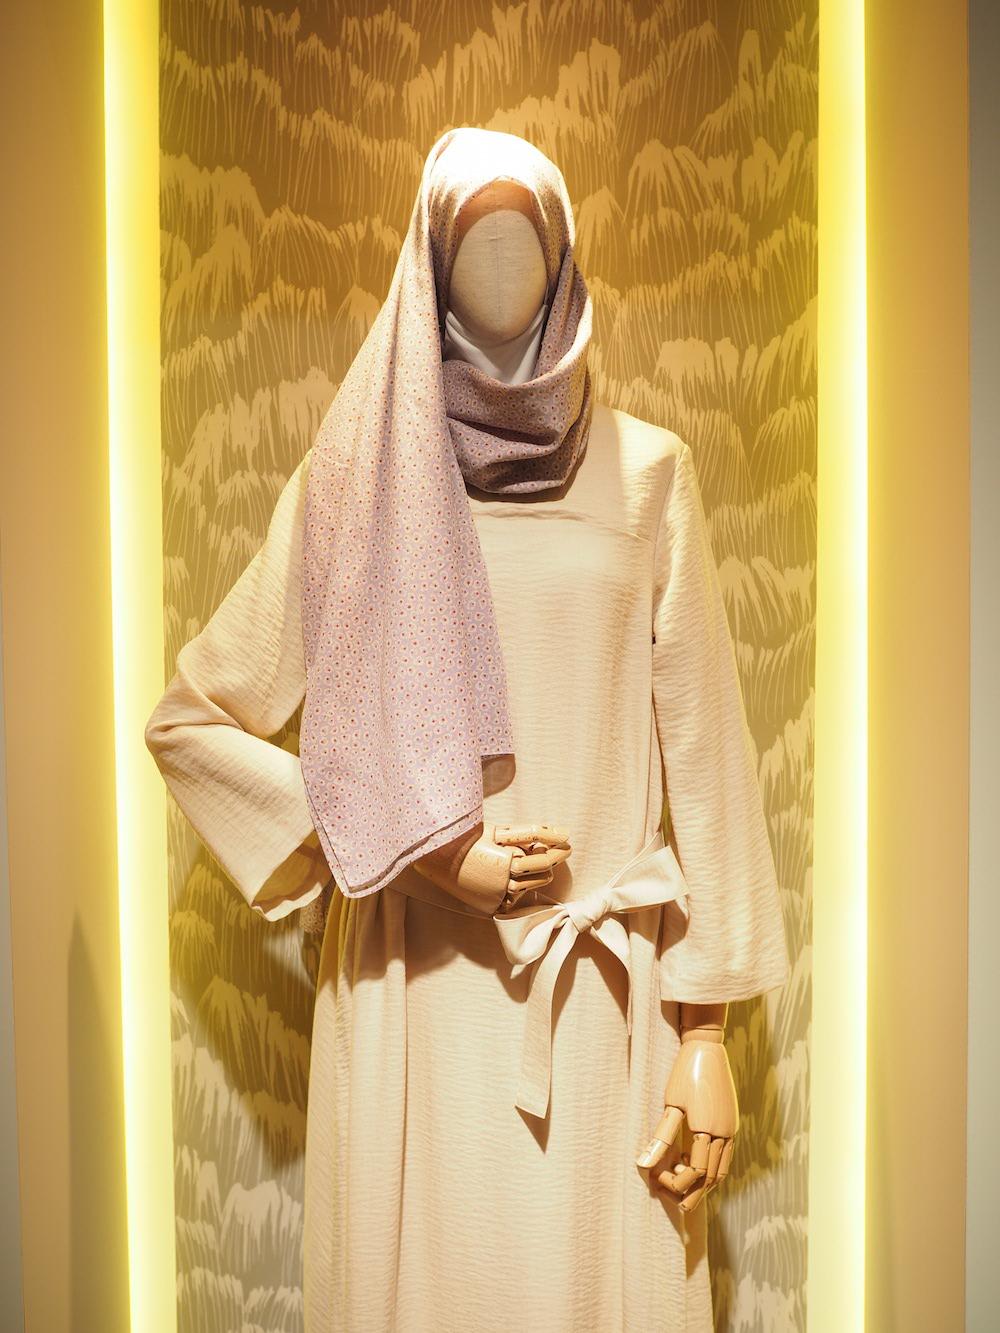 hana tajima for uniqlo designs on display at Uniqlo Lifewear 2017 SS exhibit in Tokyo